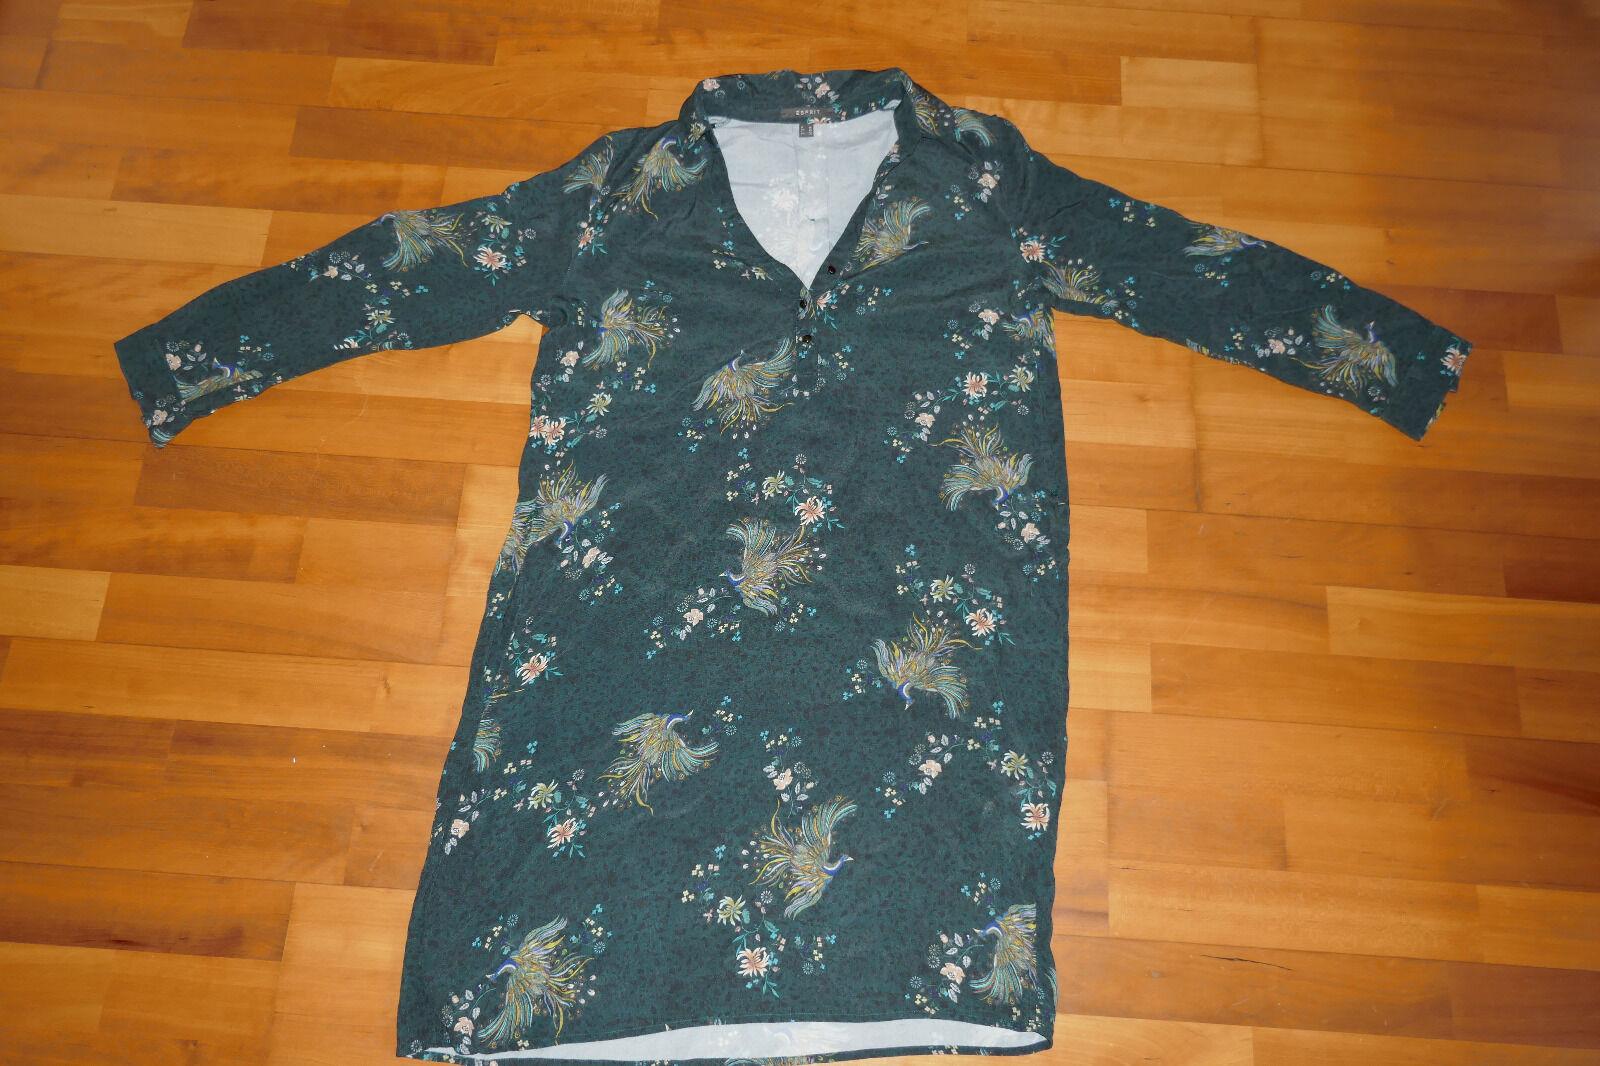 Kleid Blausenkleid Hemdkleid Damen Esprit Gr. 36 Pfau Reiher Blaumen Asia grün neu